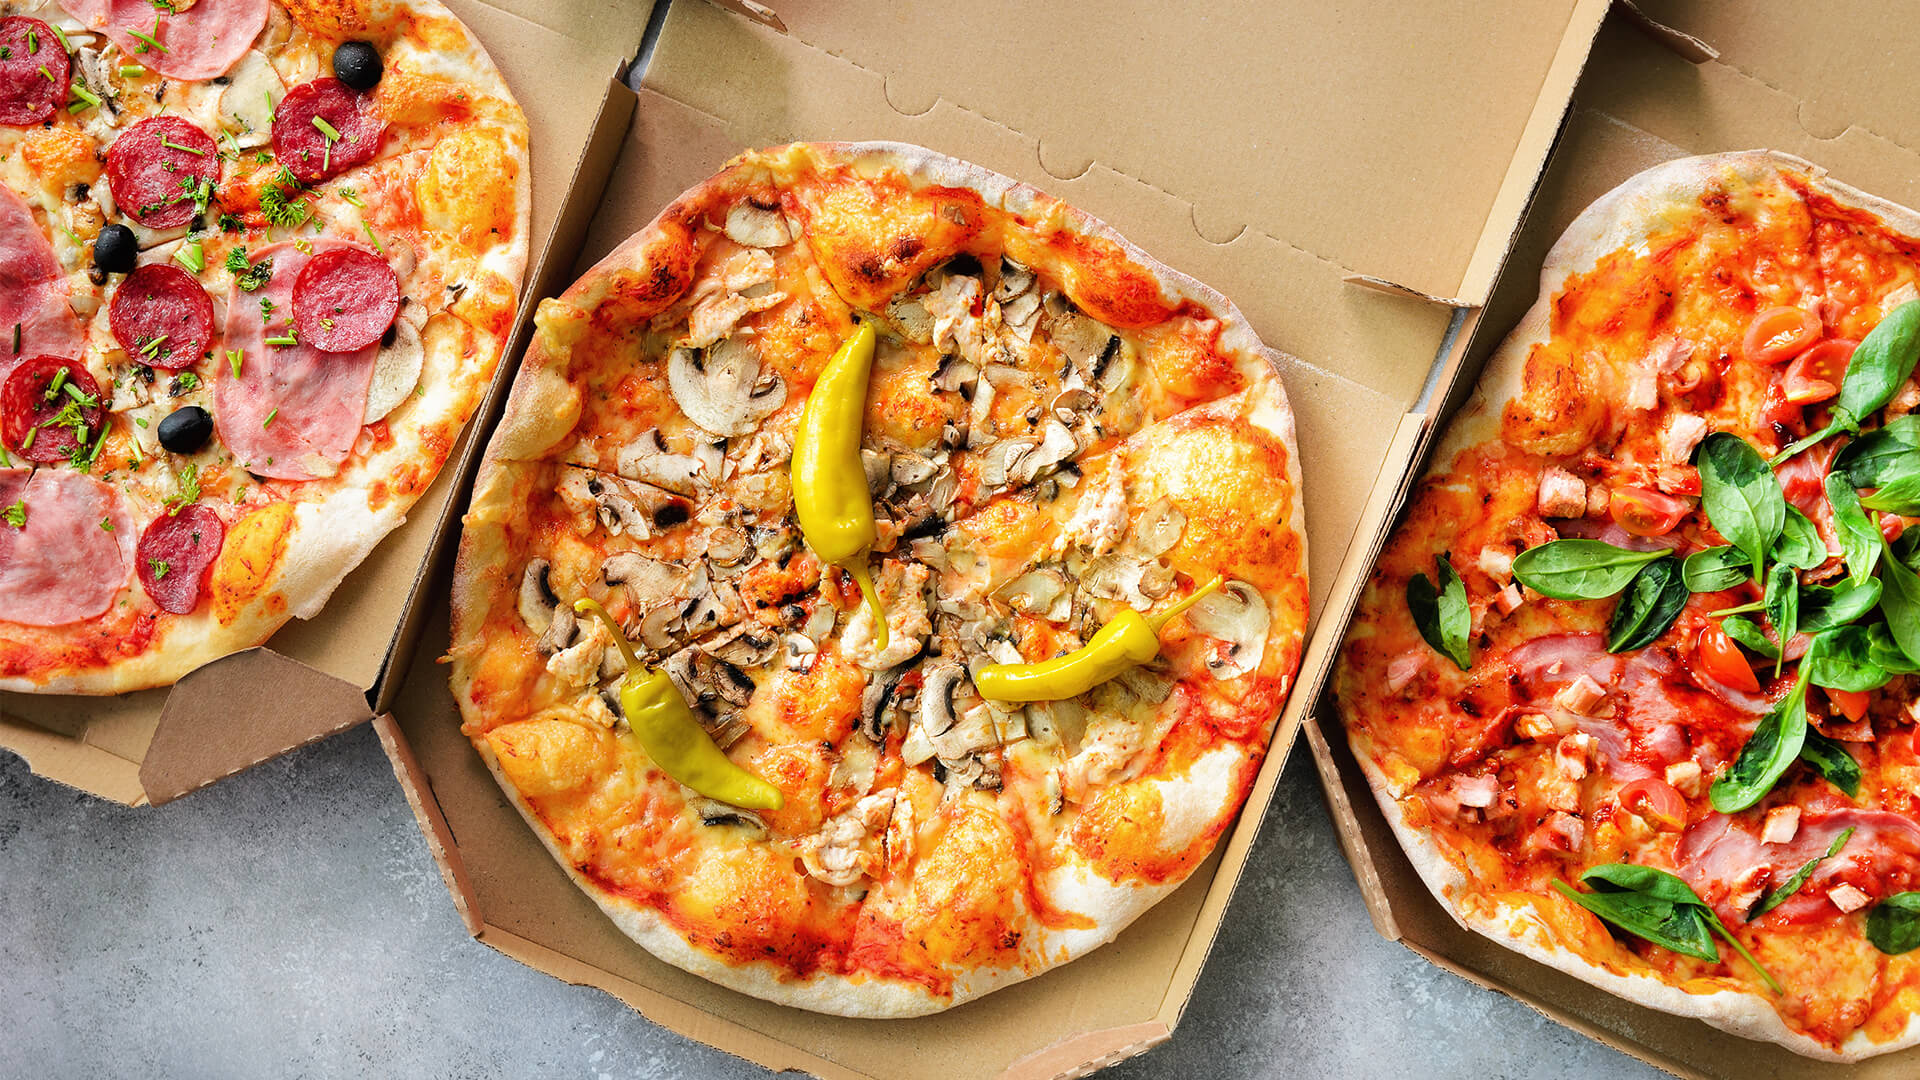 Fresh pizza in a box